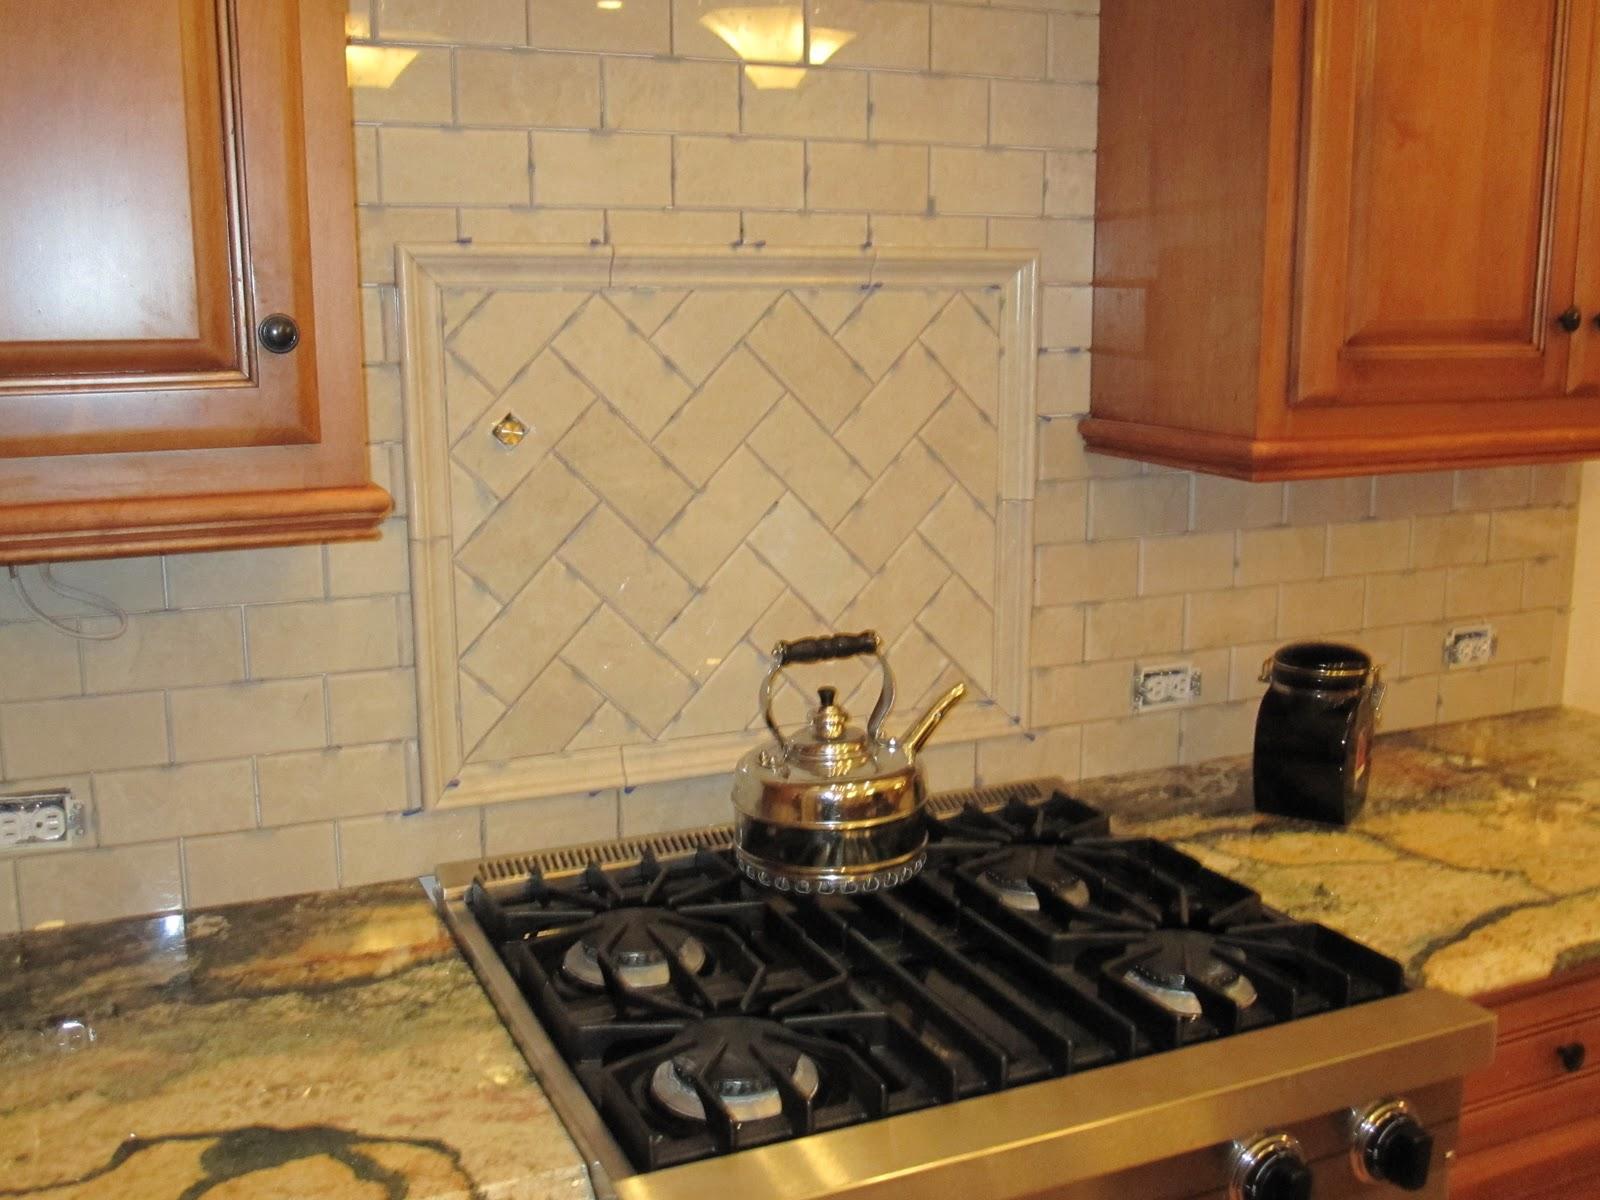 pic new posts: Wallpaper Tile Look